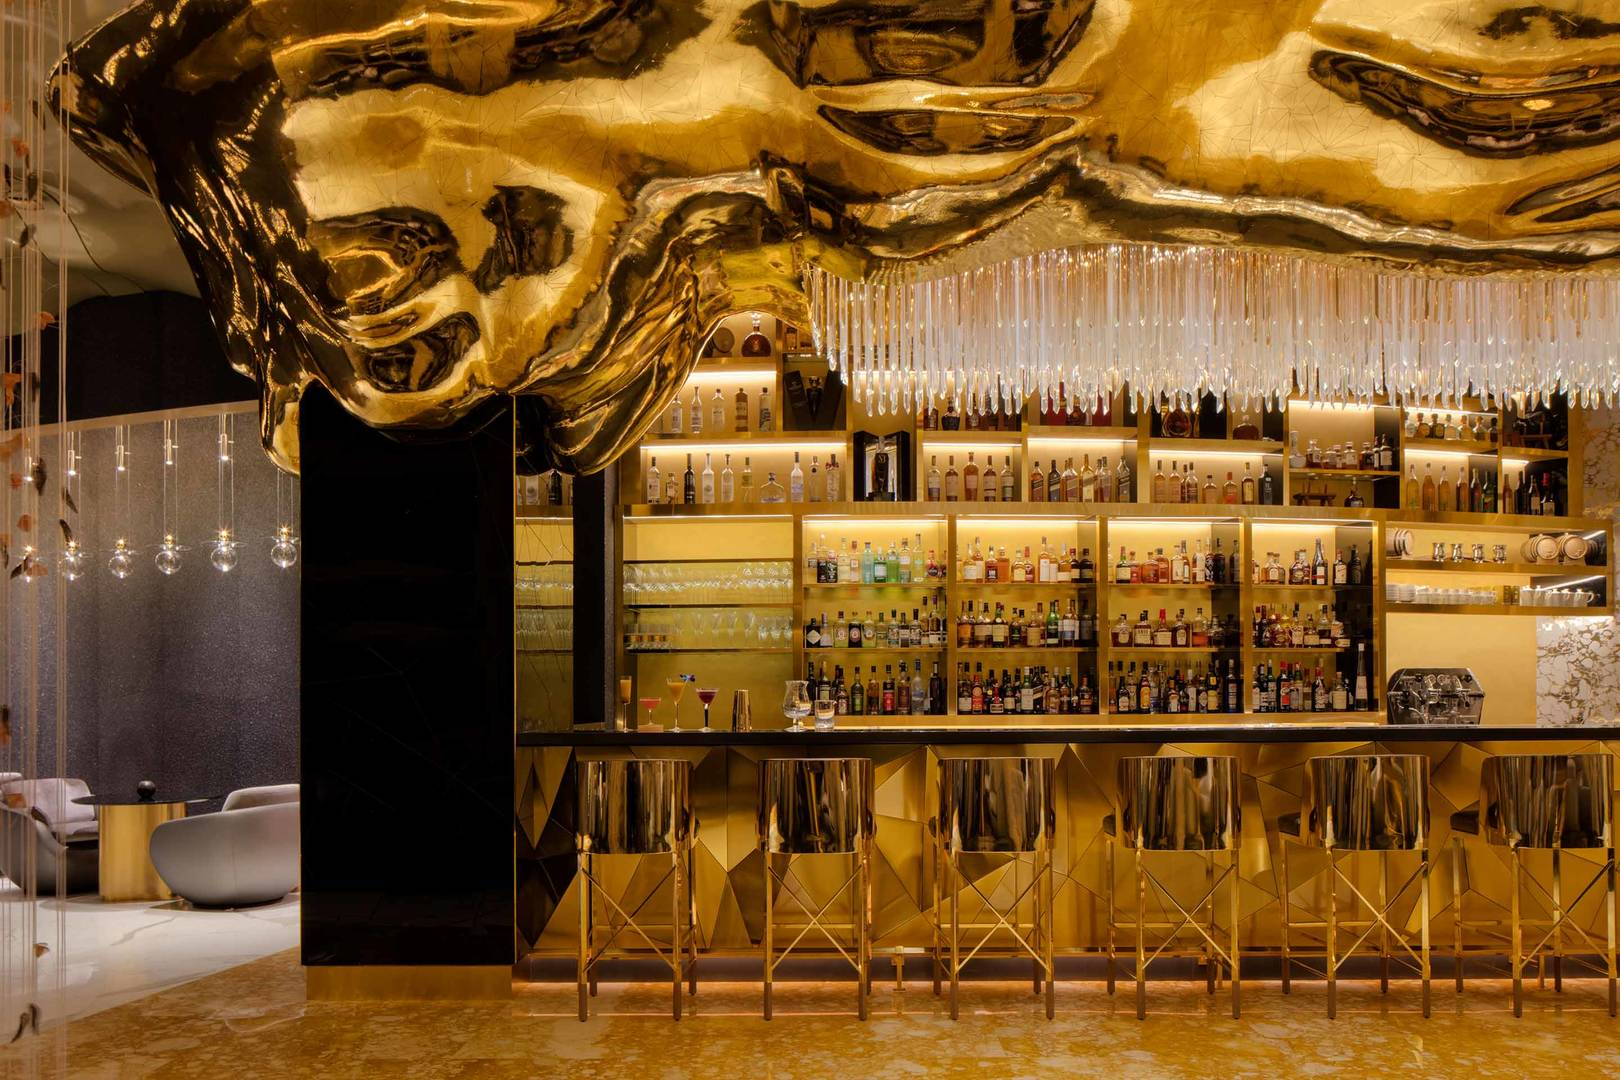 https://cdn.jumeirah.com/-/mediadh/DH/Hospitality/Jumeirah/Restaurants/Dubai/Burj-Al-Arab-Gold-on-27/Restaurant-Gallery/Burj-Al-Arab-Gold-On-27_6-4.jpg?h=1080&w=1620&hash=D9A2B542C5A1CB54835A5EB0AFAD87EF